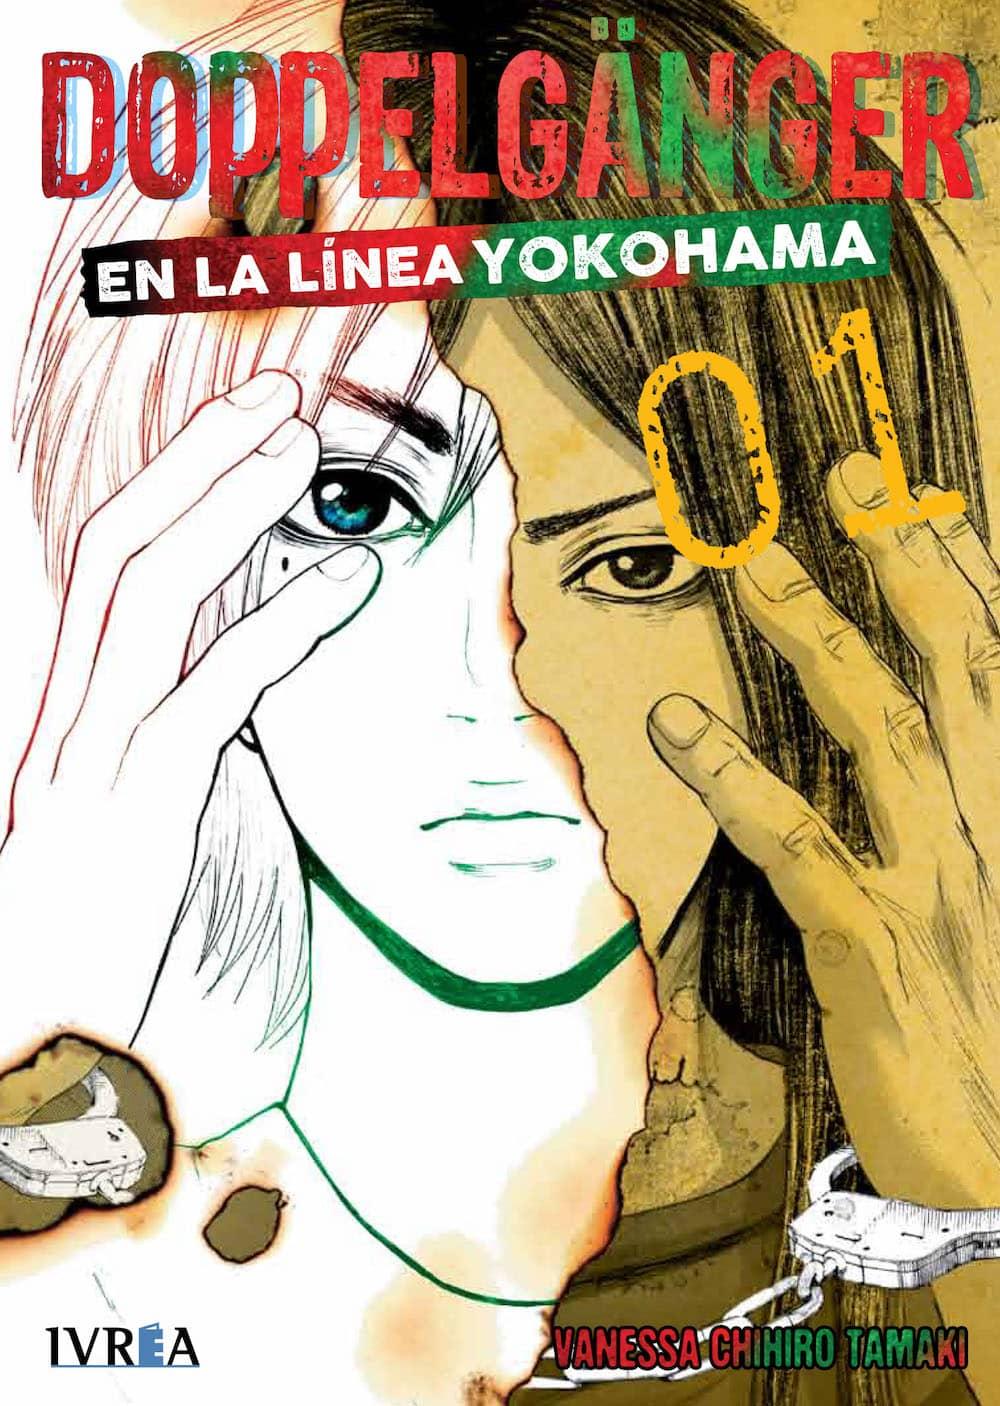 DOPPELGANGER 01 EN LA LINEA DE YOKOHAMA